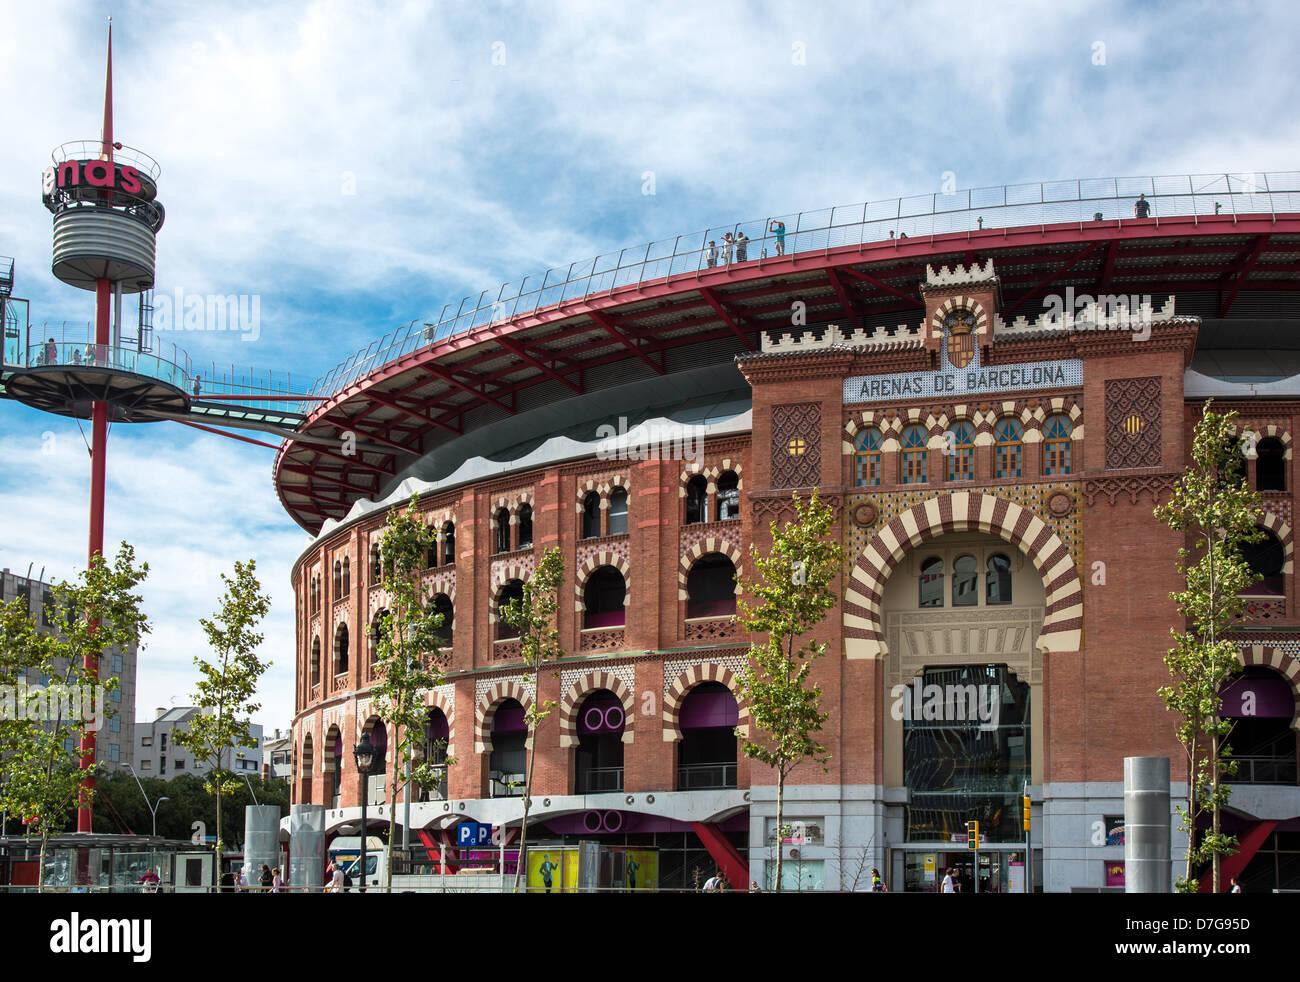 Spain Barcelona The Arenas An Ancient Plaza De Toros Bullring Stock Photo Alamy